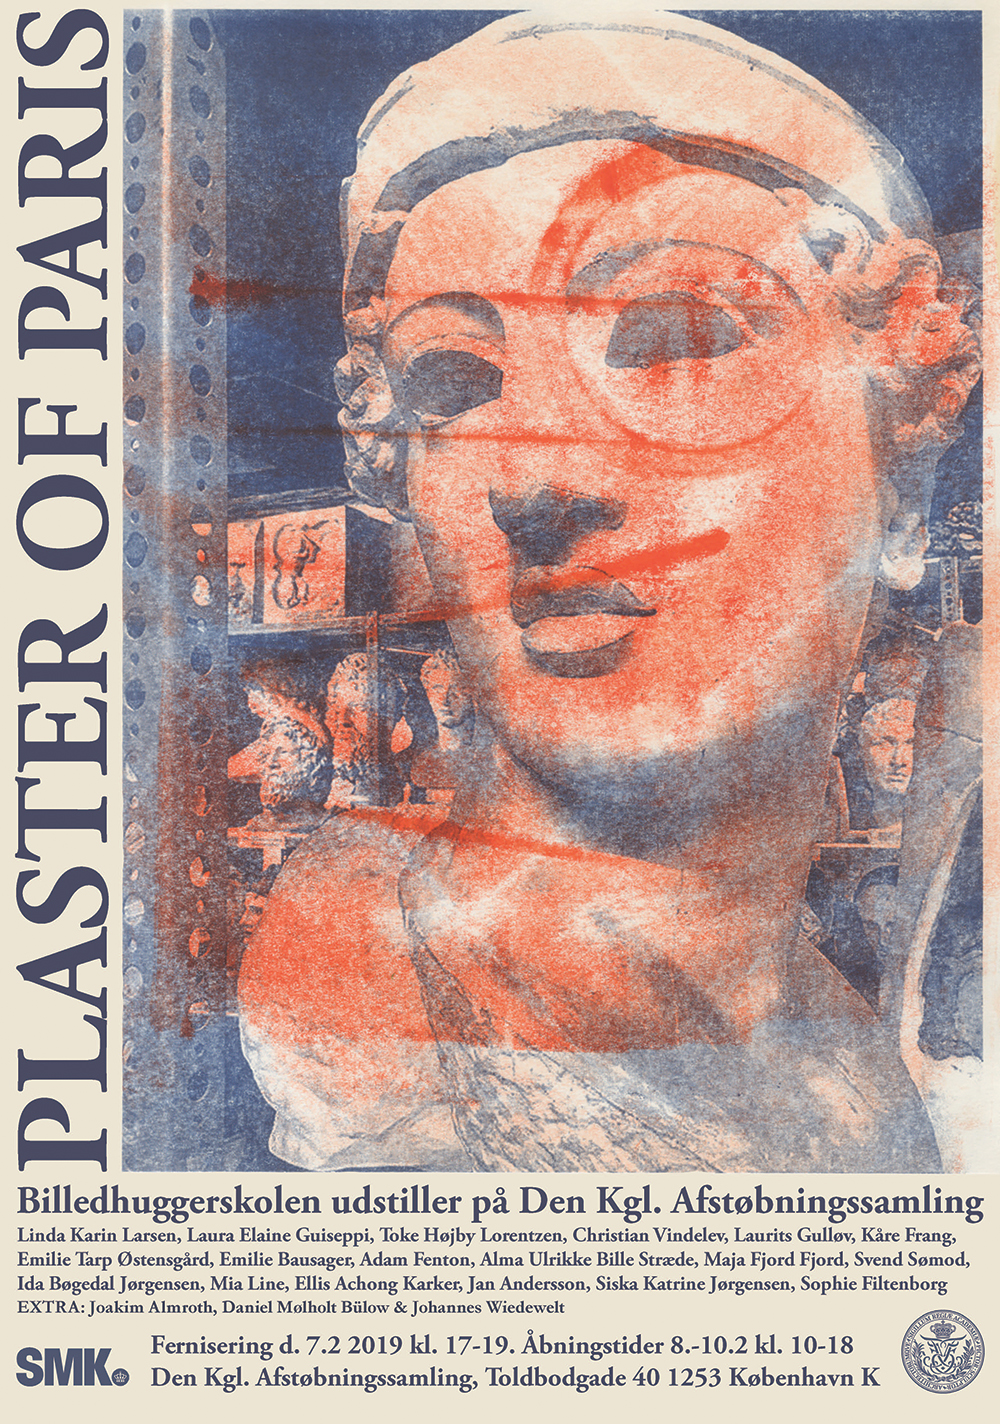 Streamer plaster of paris